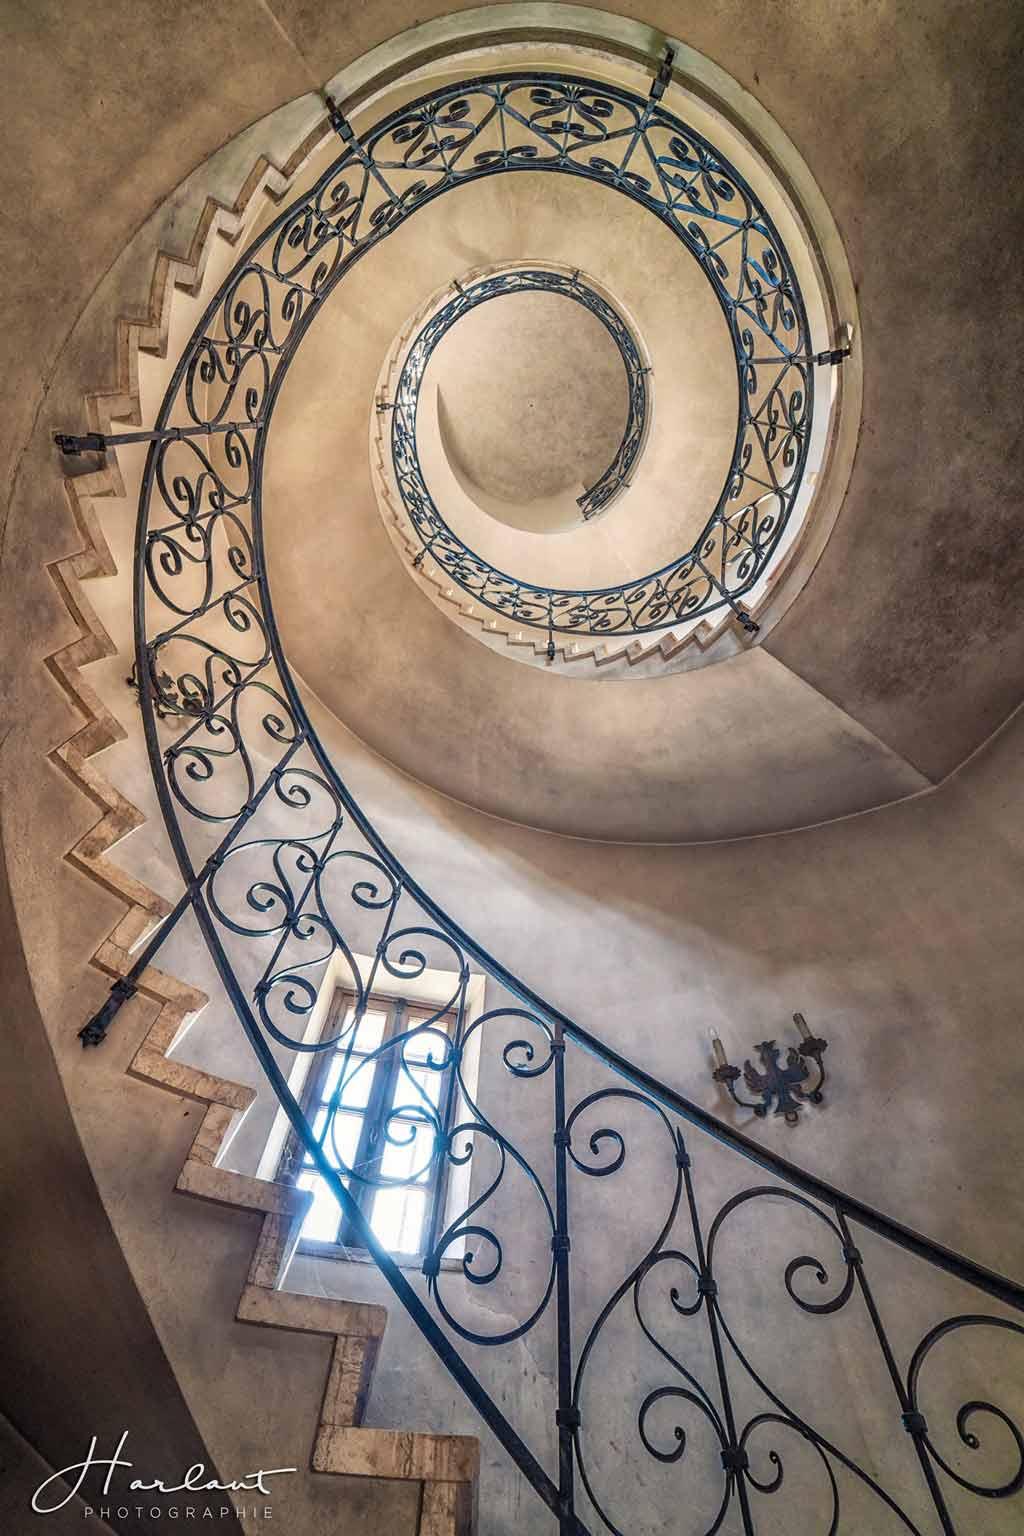 Julien-Harlaut---Escalier_0067